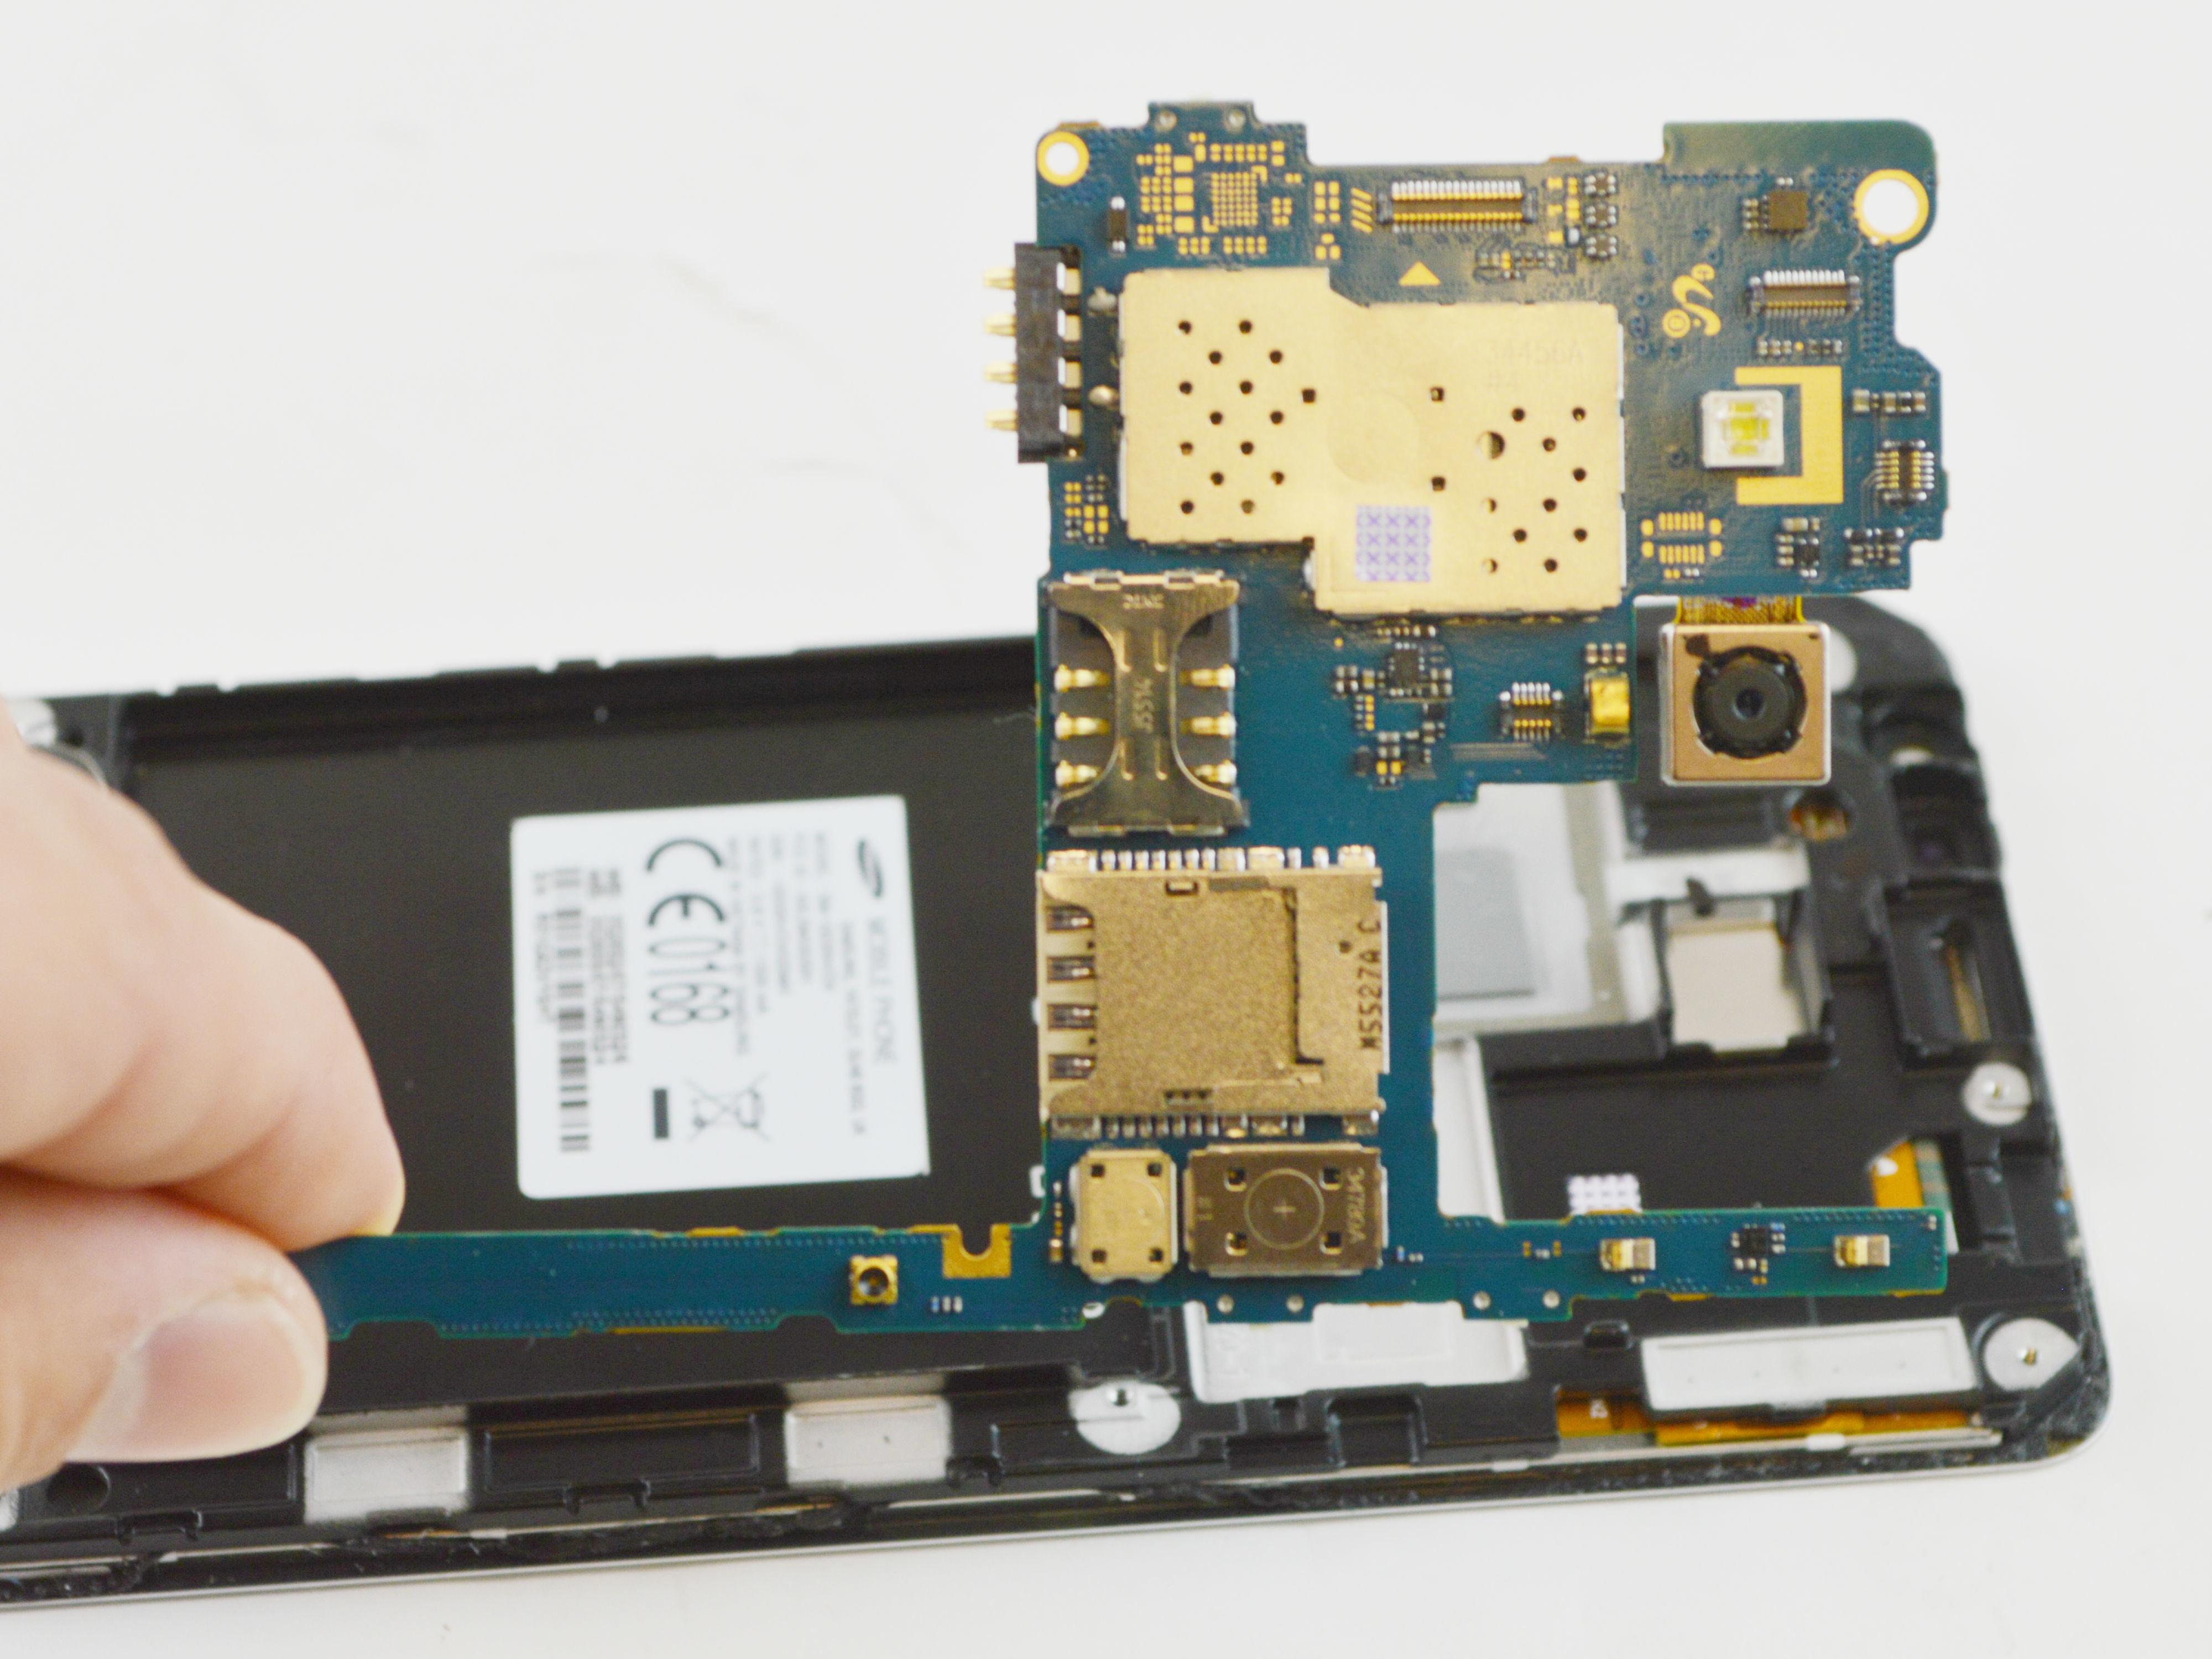 Samsung Galaxy Grand Prime - iFixit